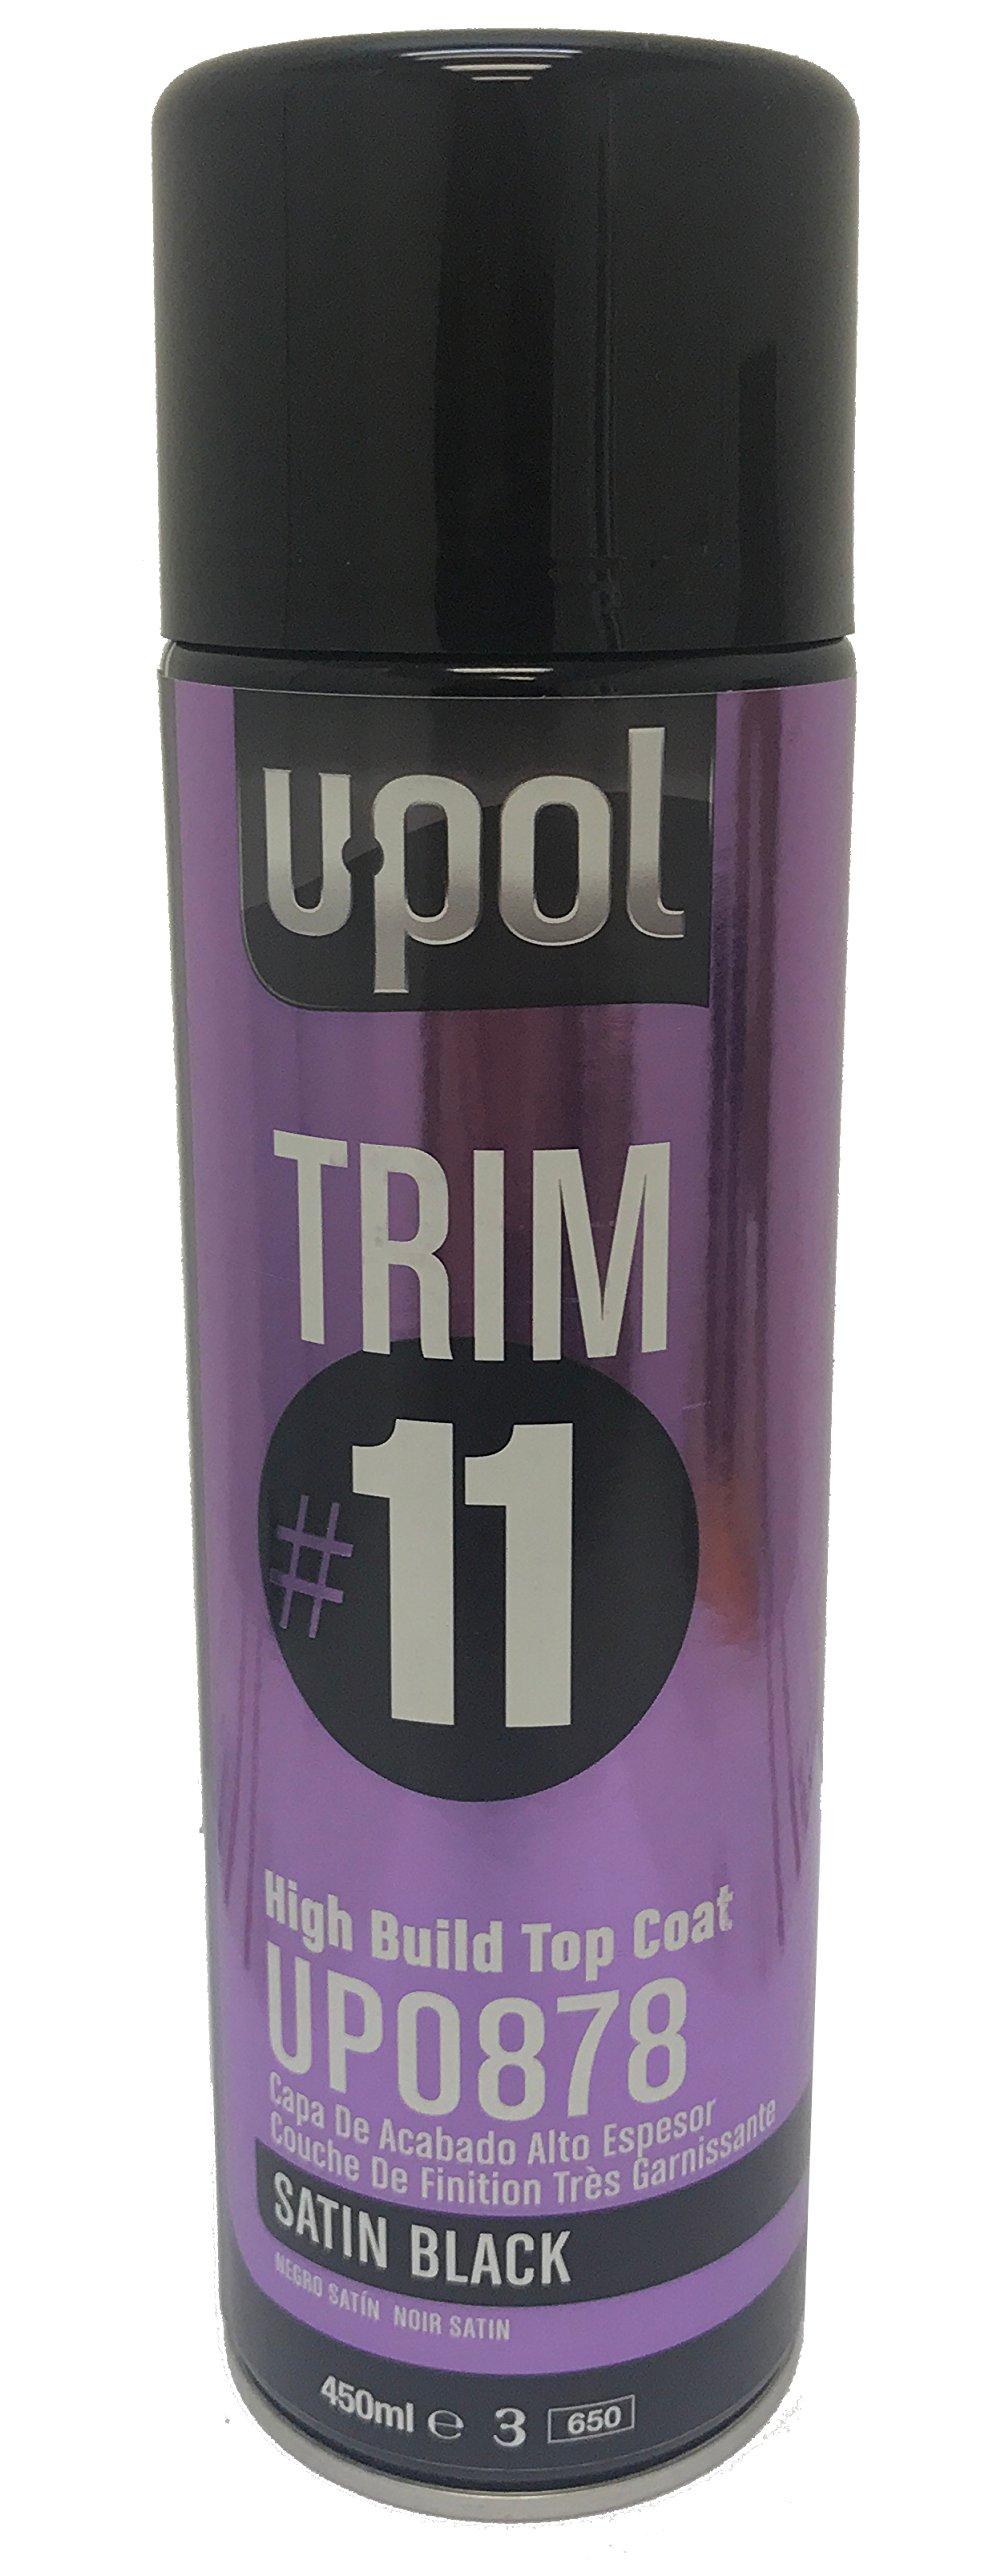 U-Pol TRIM#11 High Build Top Coat Premium Aerosols, 450ml (12oz) (Satin Black)